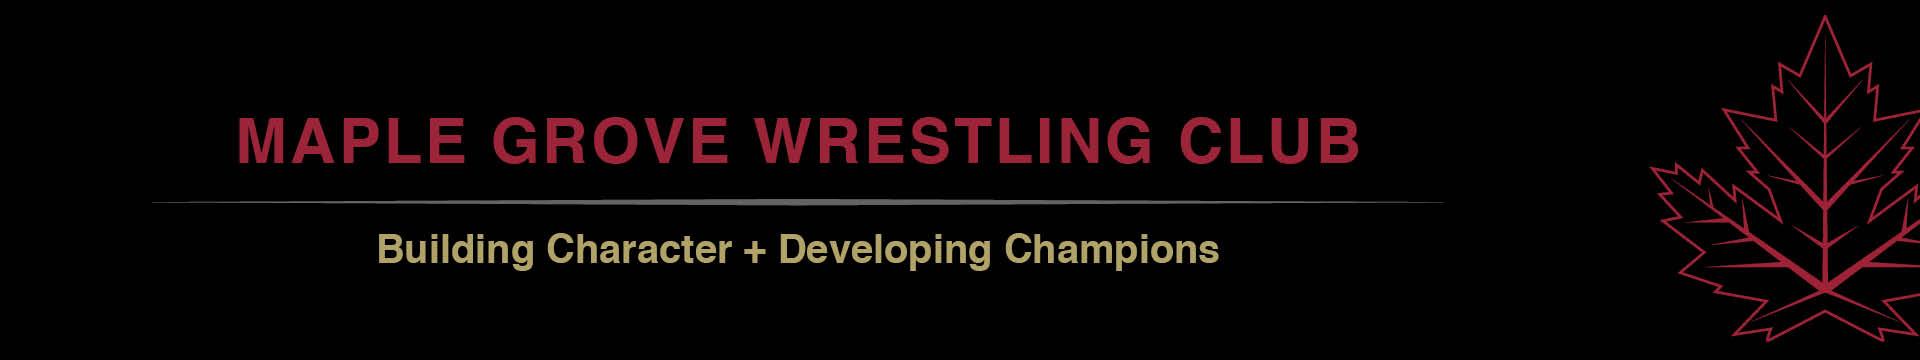 Website banner 2020  002